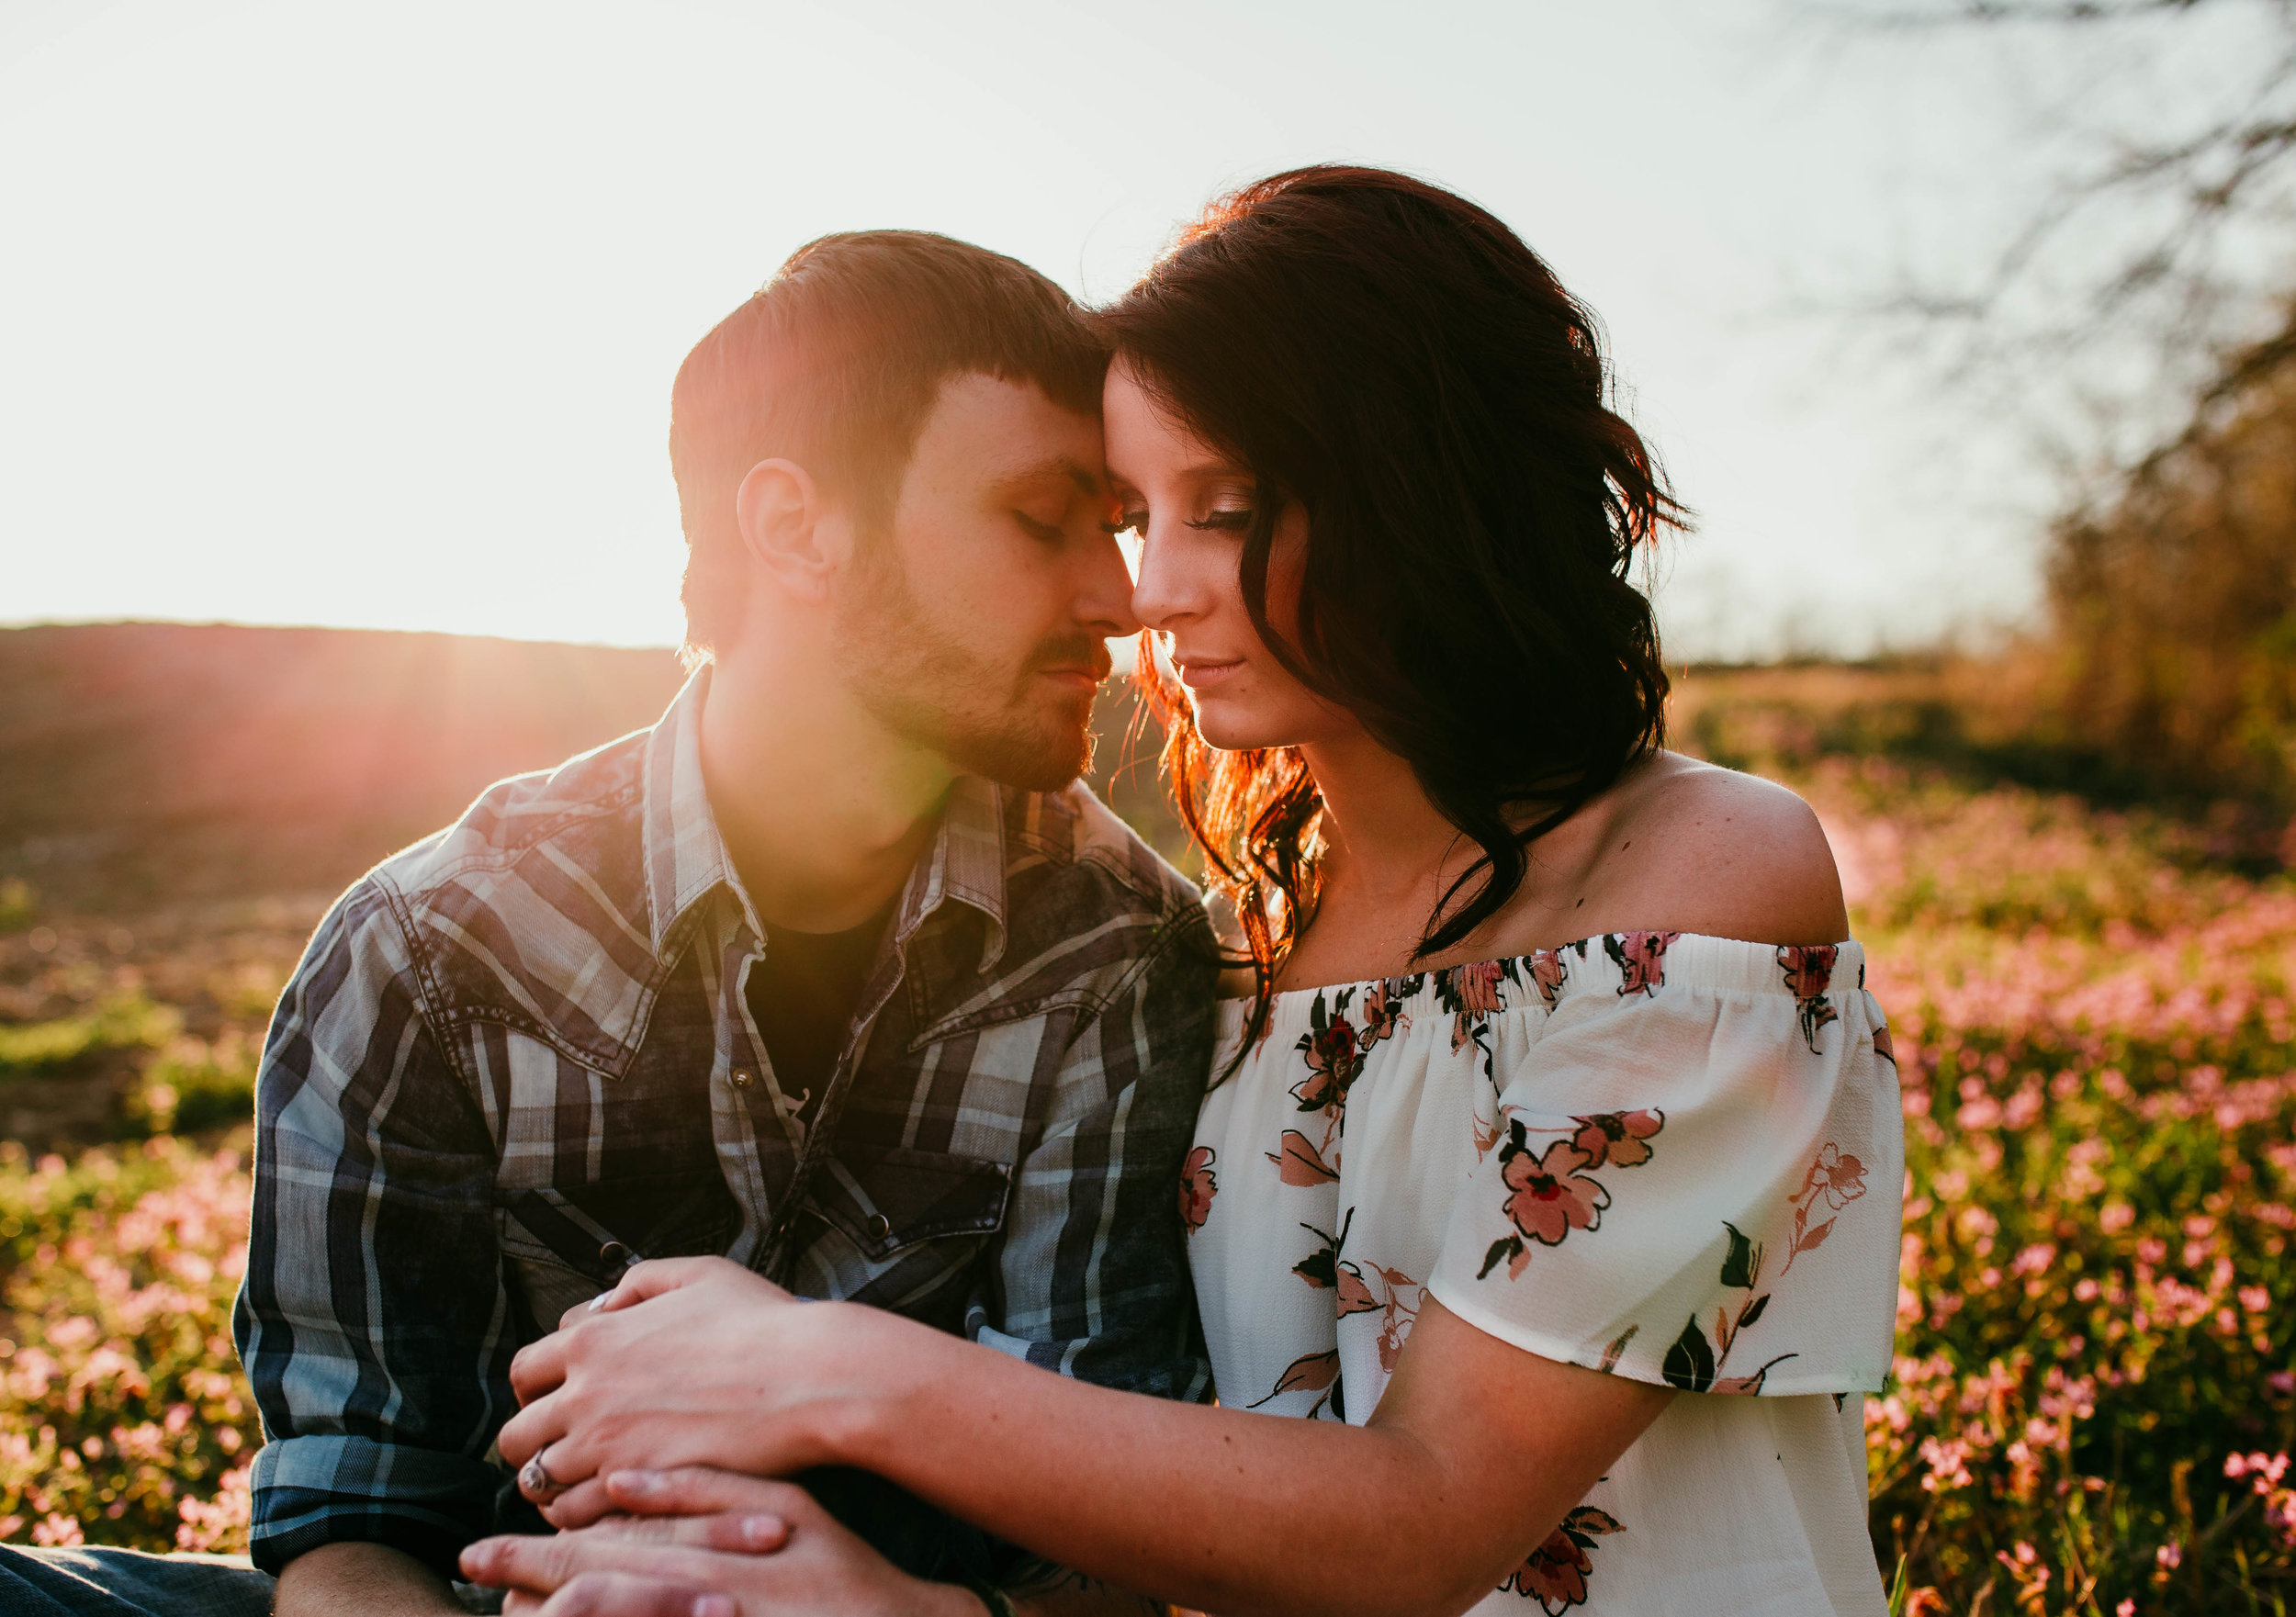 Dalton & Alexa Lexington, MO Engagement | Hannahill Photography | Kansas City Photographer | engaged couple adventure session | wedding photography midwest | chasing light | floral dress engagement session | sunset session | Big river ranch, Lexington, Mo